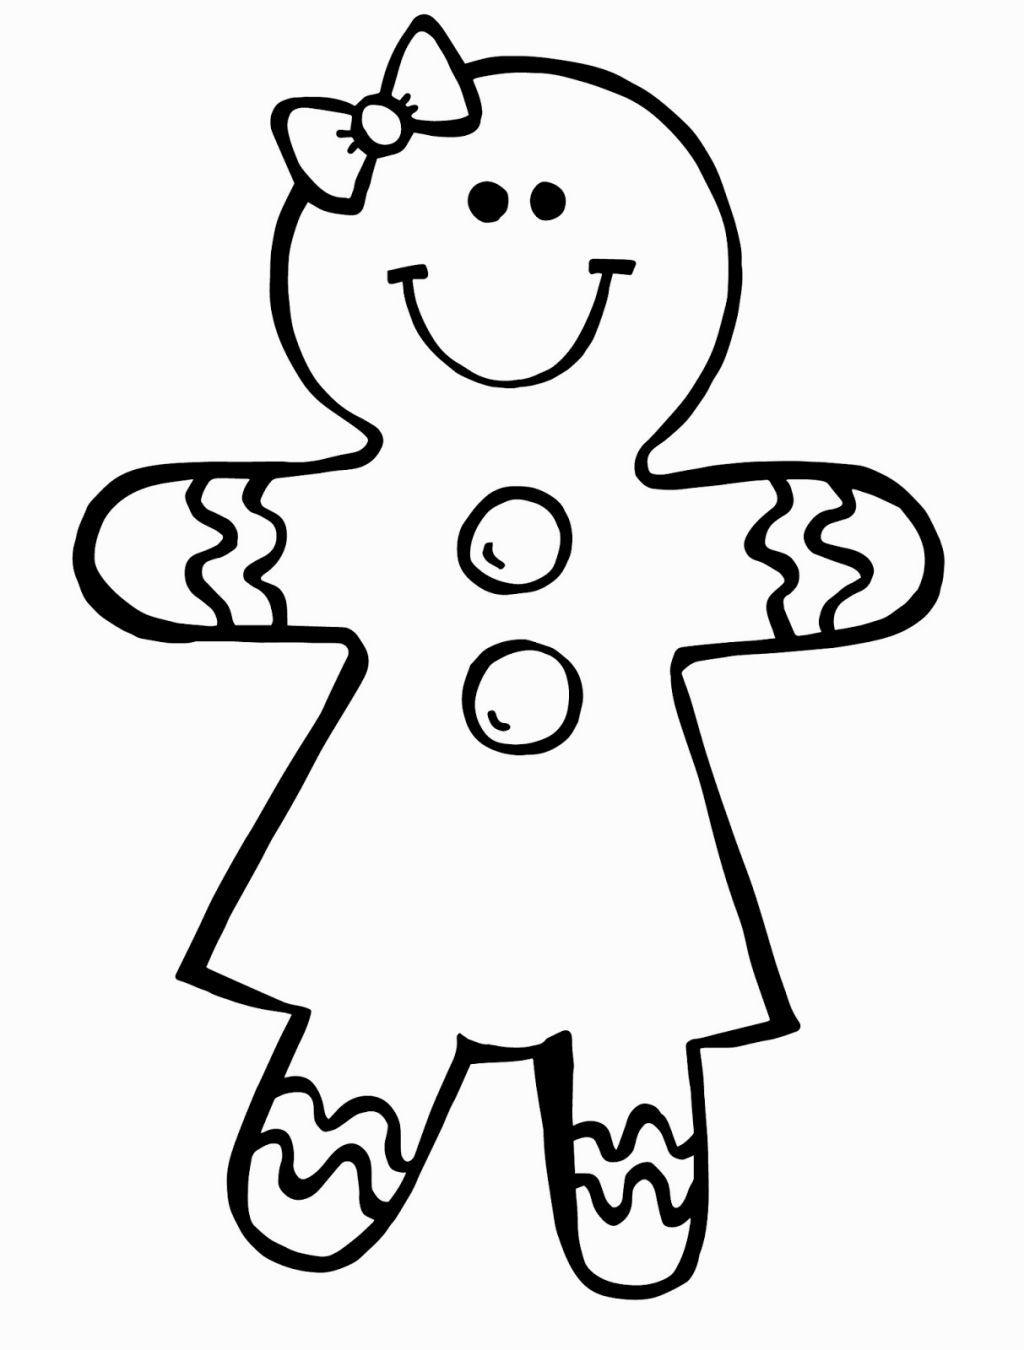 Blank christmas clipart gingerbread man image free Coloring Pages : Gingerbread Man Coloring Page Free Printable ... image free